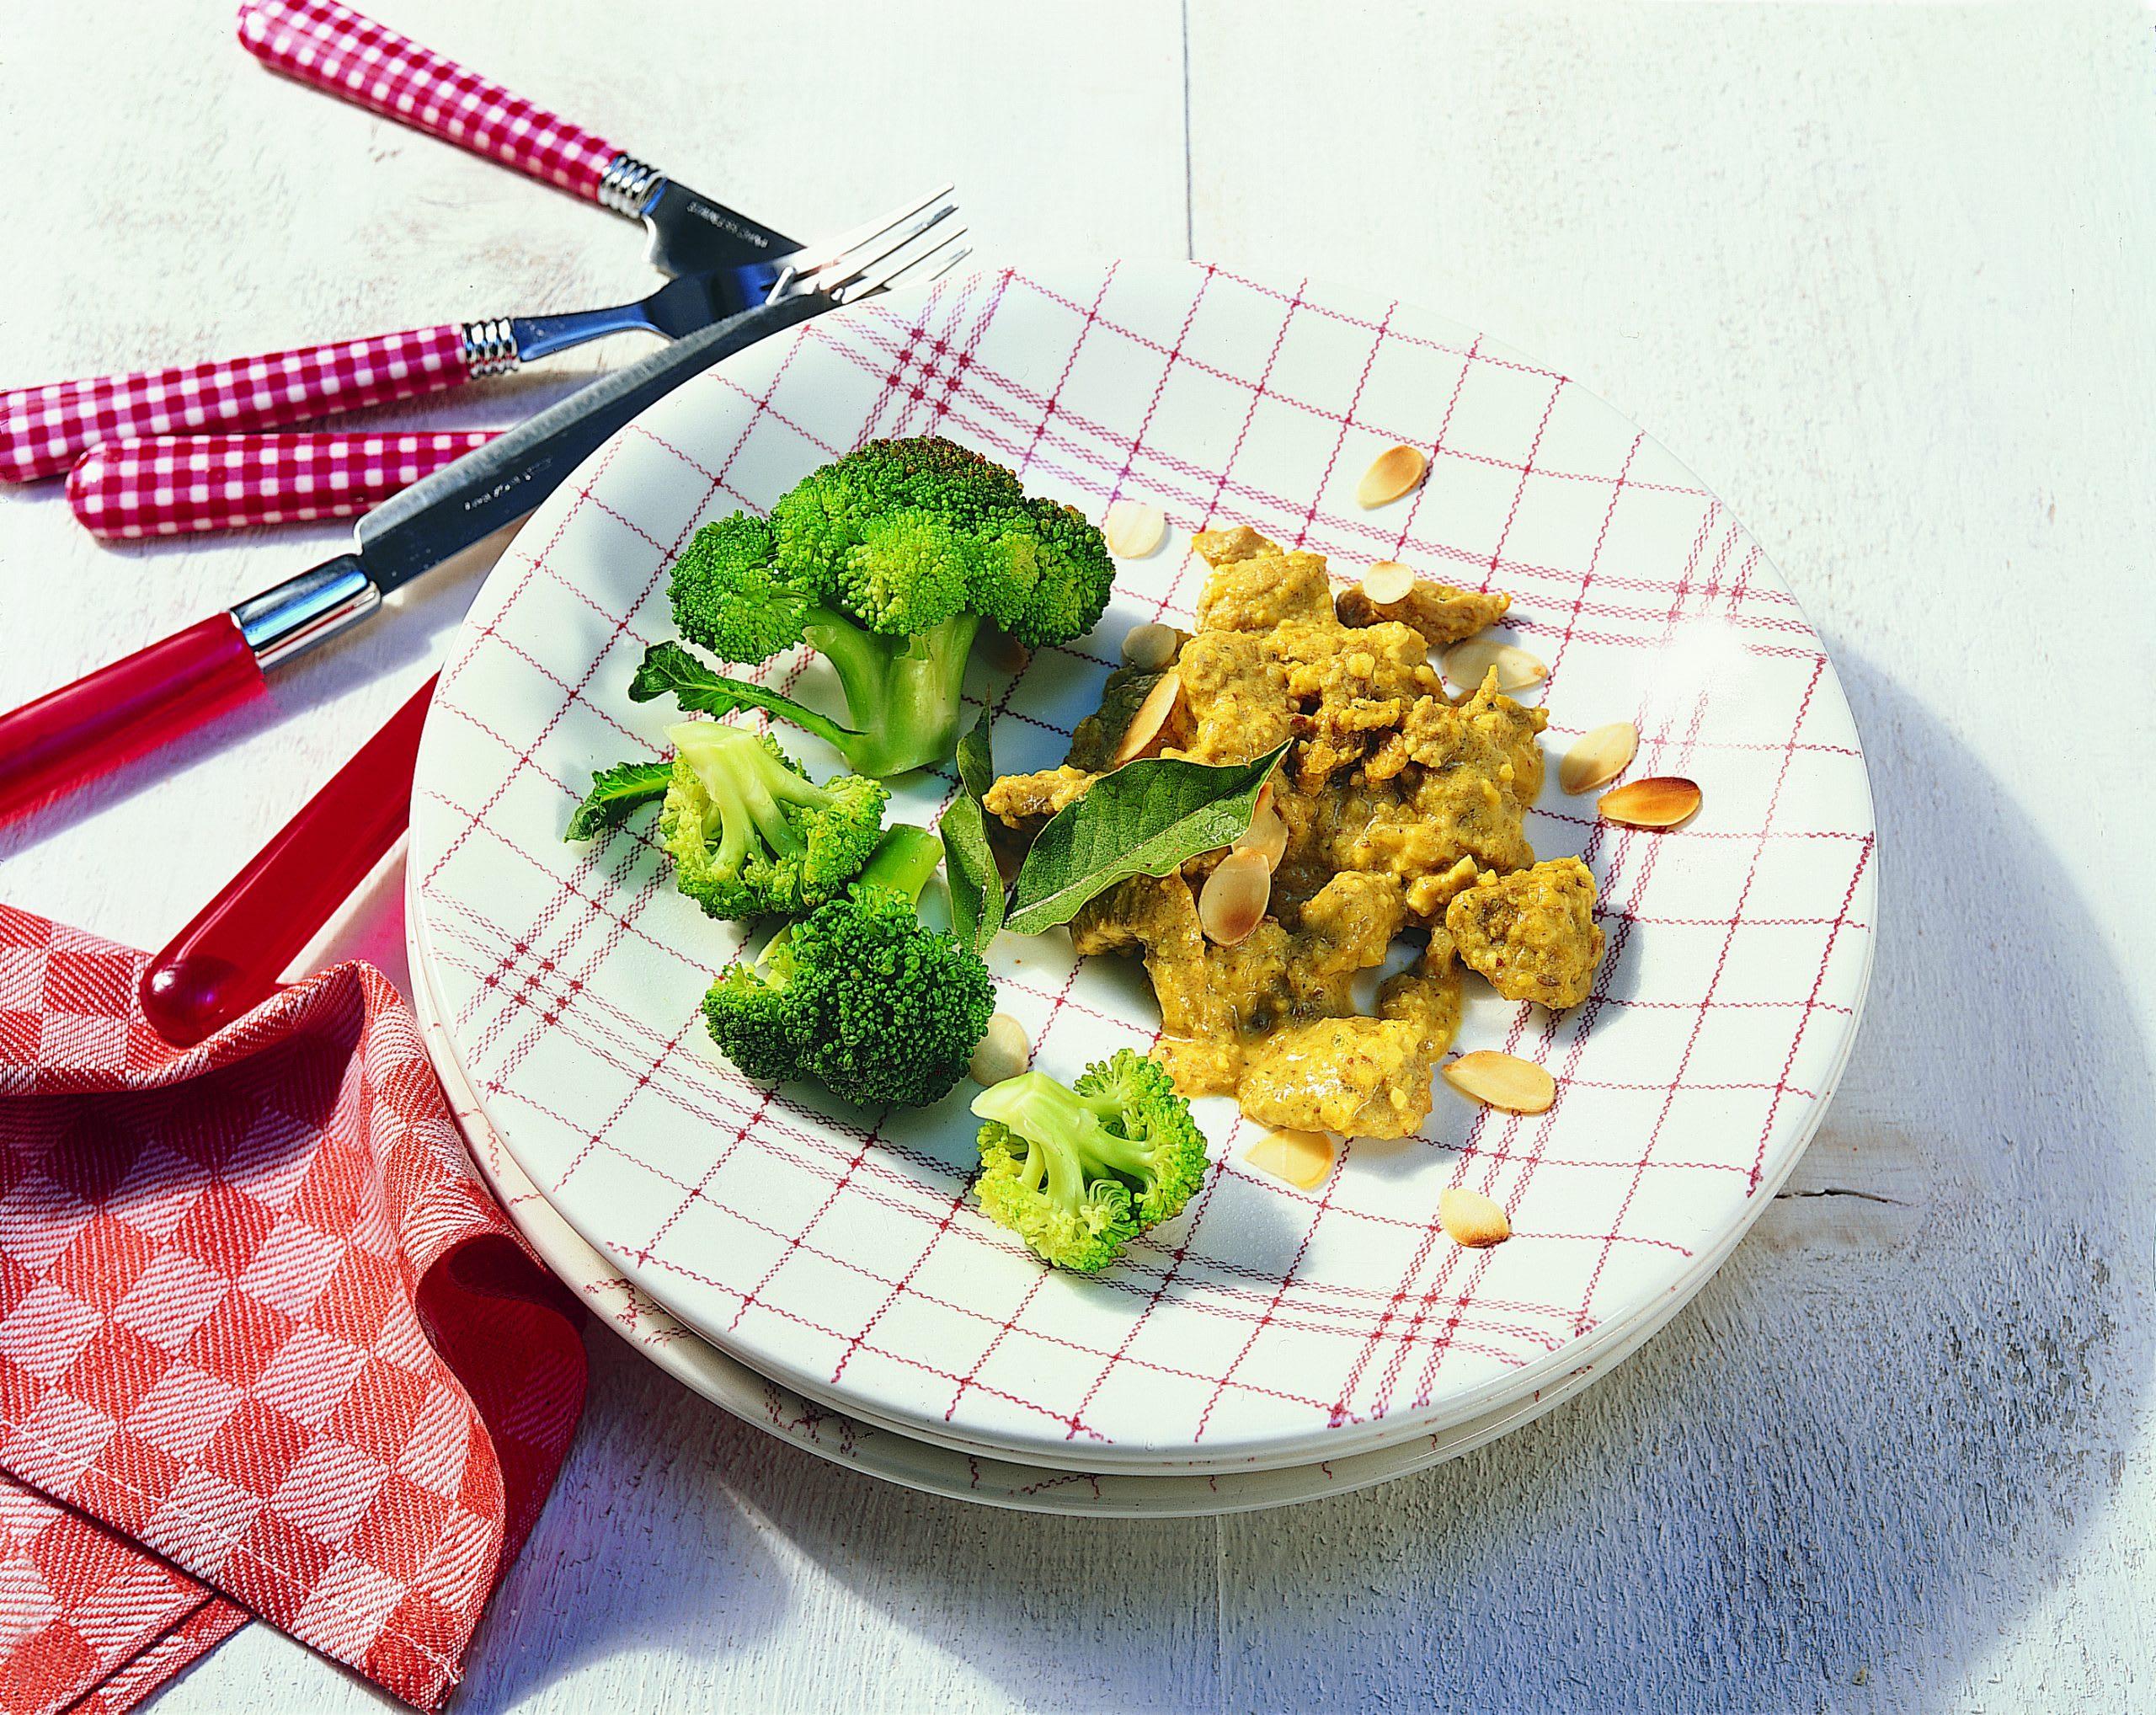 Würziges Kalbsgeschnetzeltes an Mandel-Joghurt-Sauce mit gedämpftem Broccoli